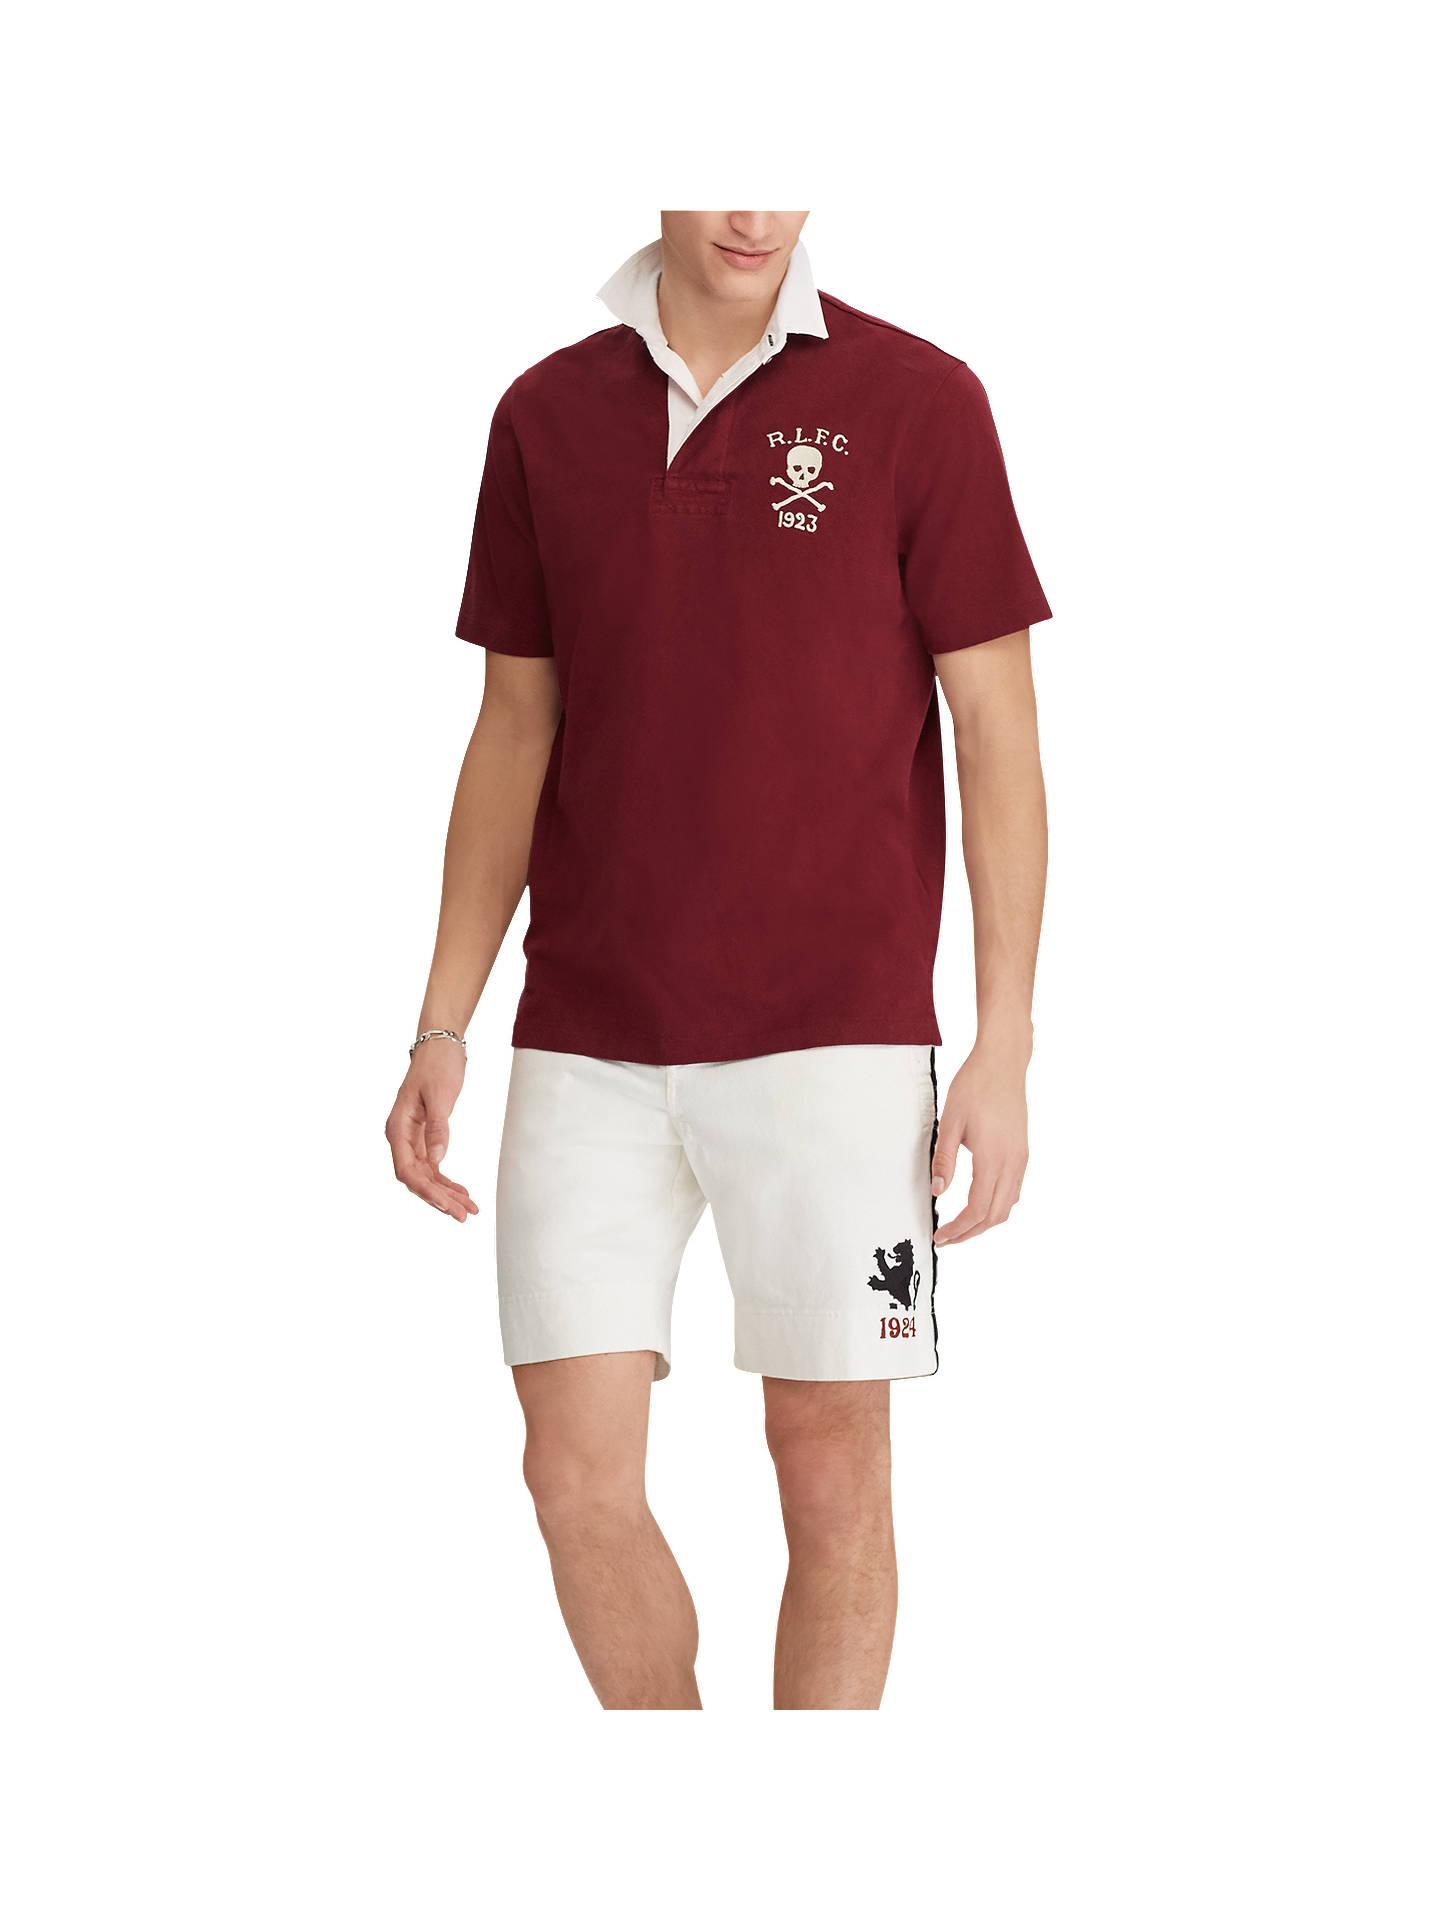 5beb28cf35d1 ... shopping buypolo ralph lauren short sleeve skull polo shirt classic  wine l online at johnlewis ba676